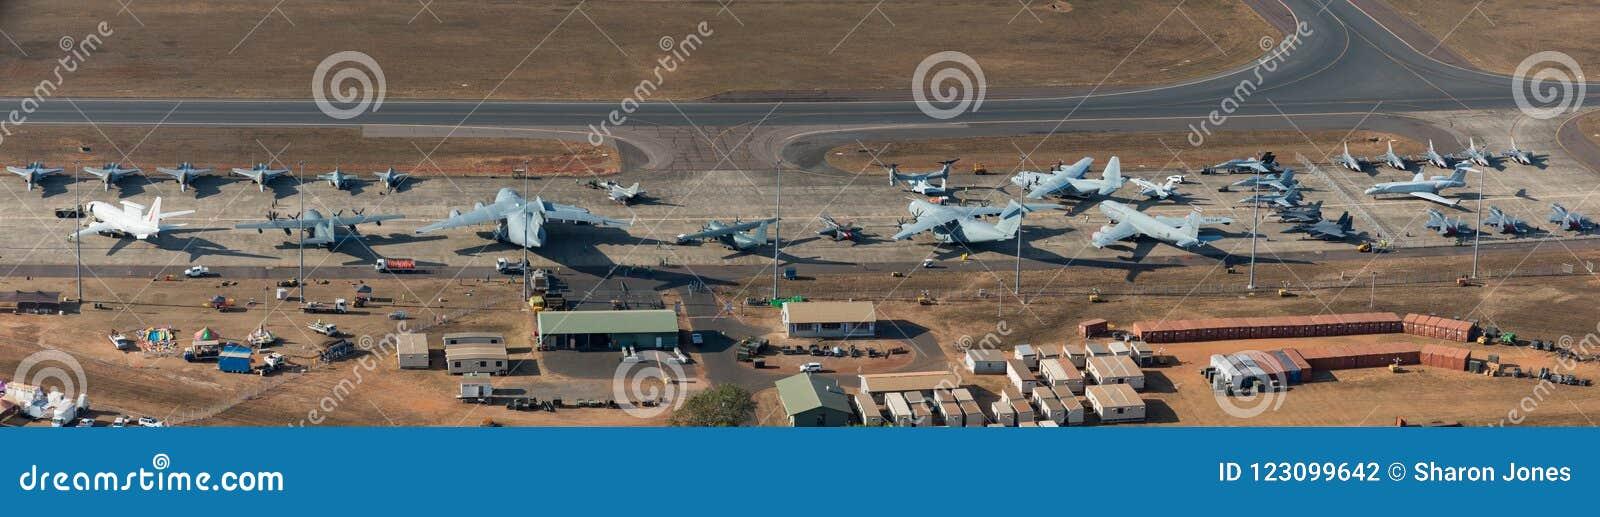 Darwin, Australia - August 4, 2018: Aerial view of military aircraft lining the tarmac at Darwin Royal Australian Airforce Base du